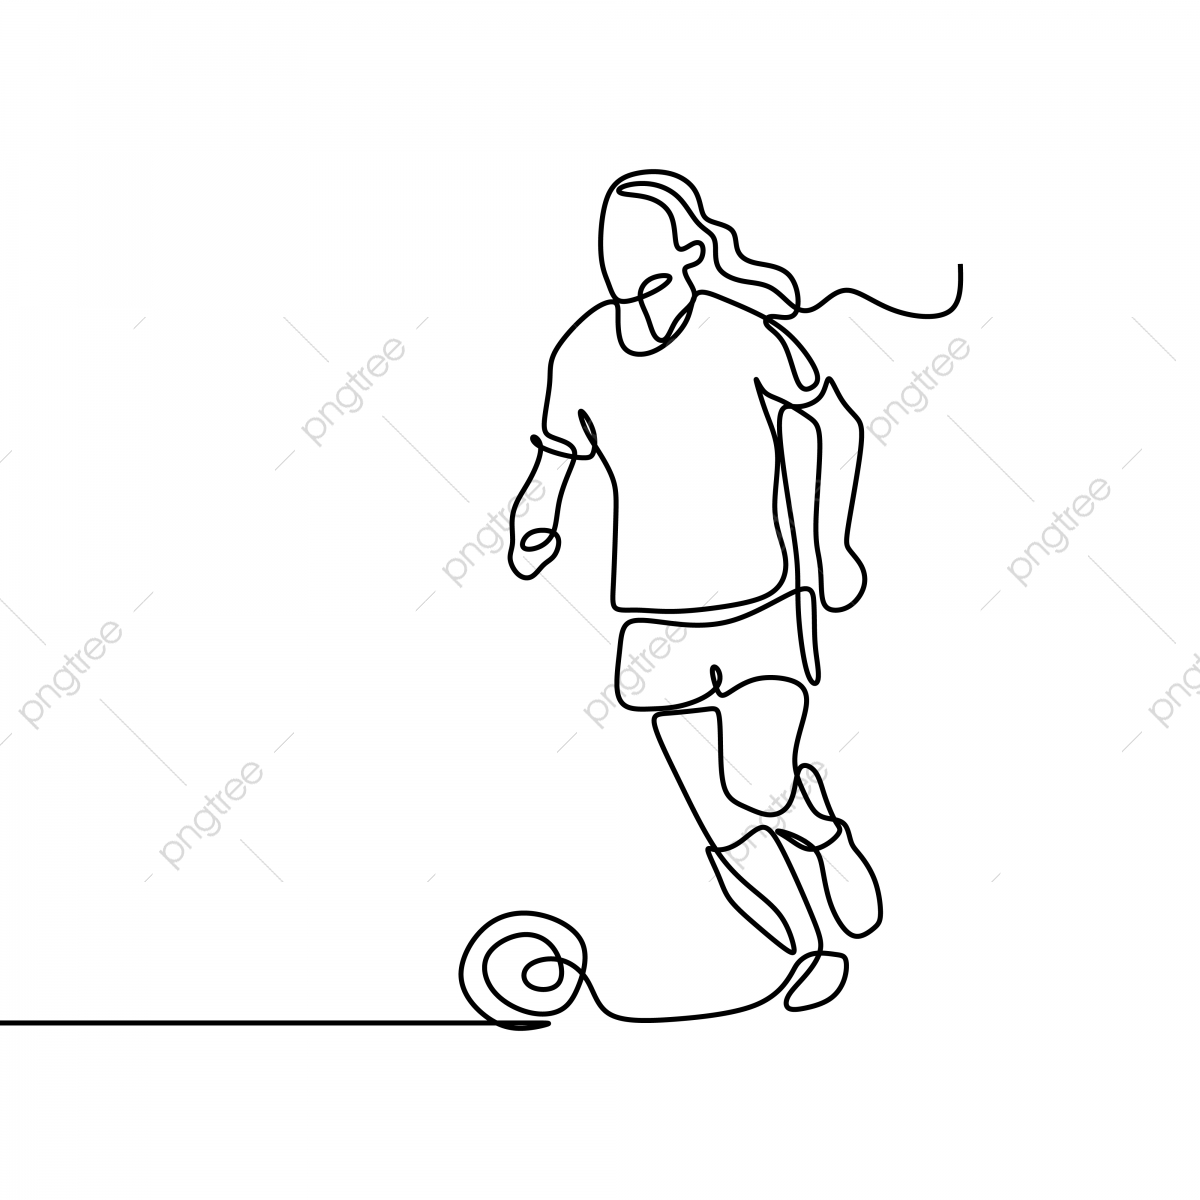 la mujer jugador de futbol continua linea de arte dibujo